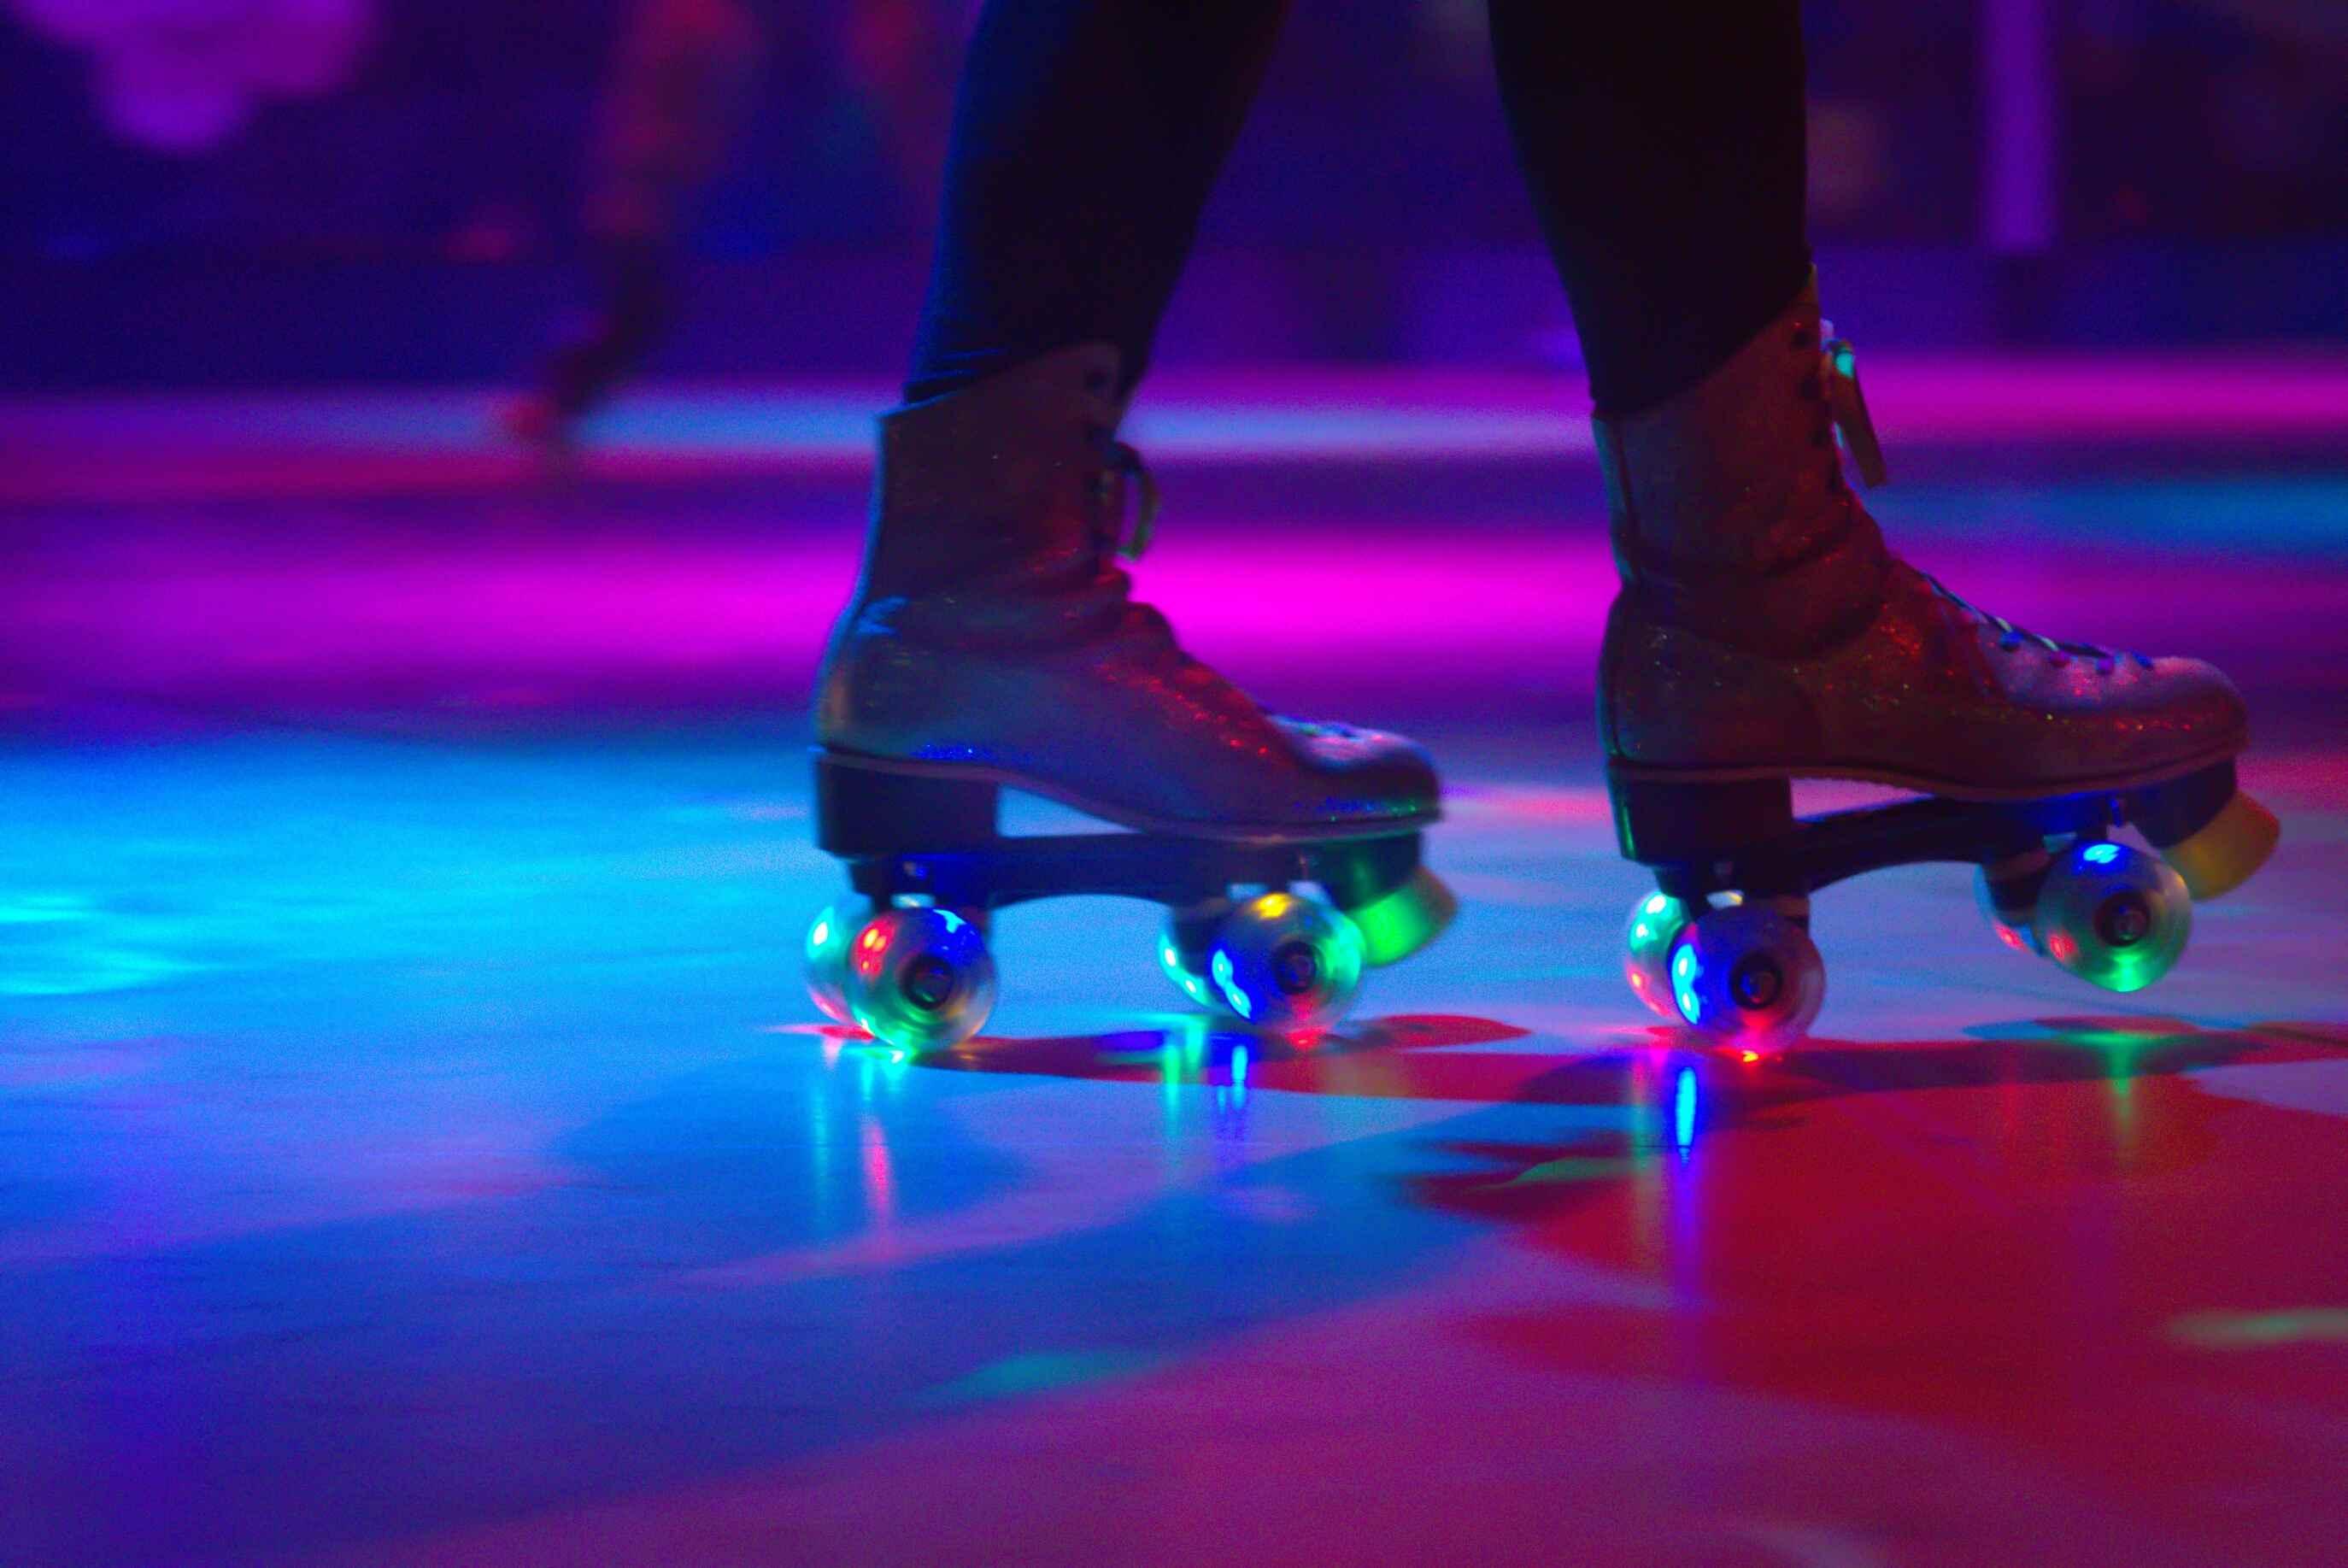 Person Roller Skating in Illuminated Rink